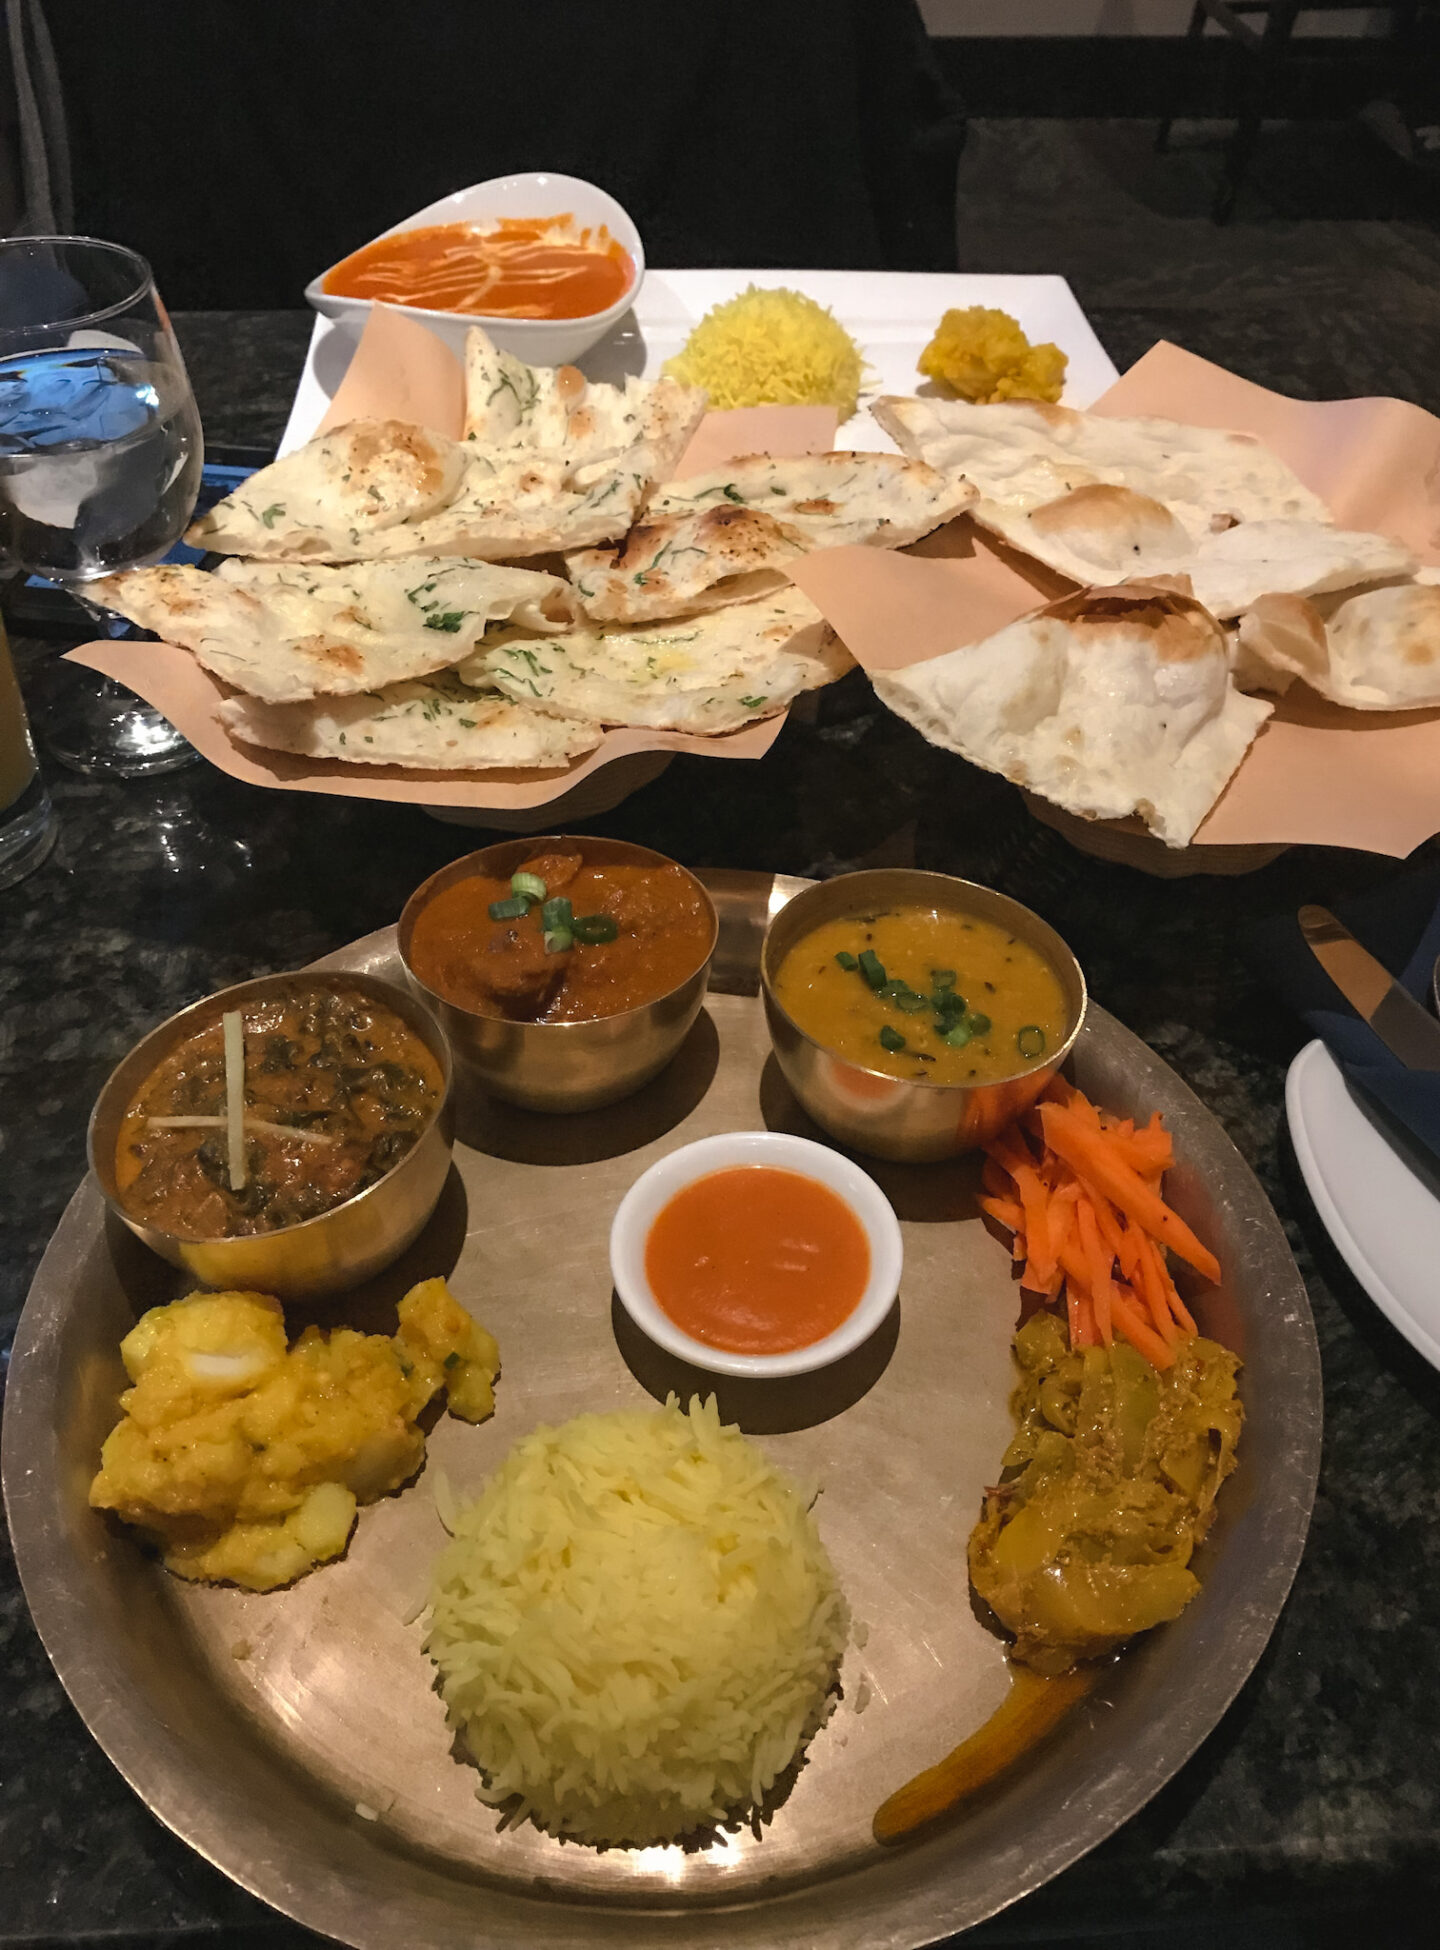 The Himalayan Restaurant in Calgary, Alberta